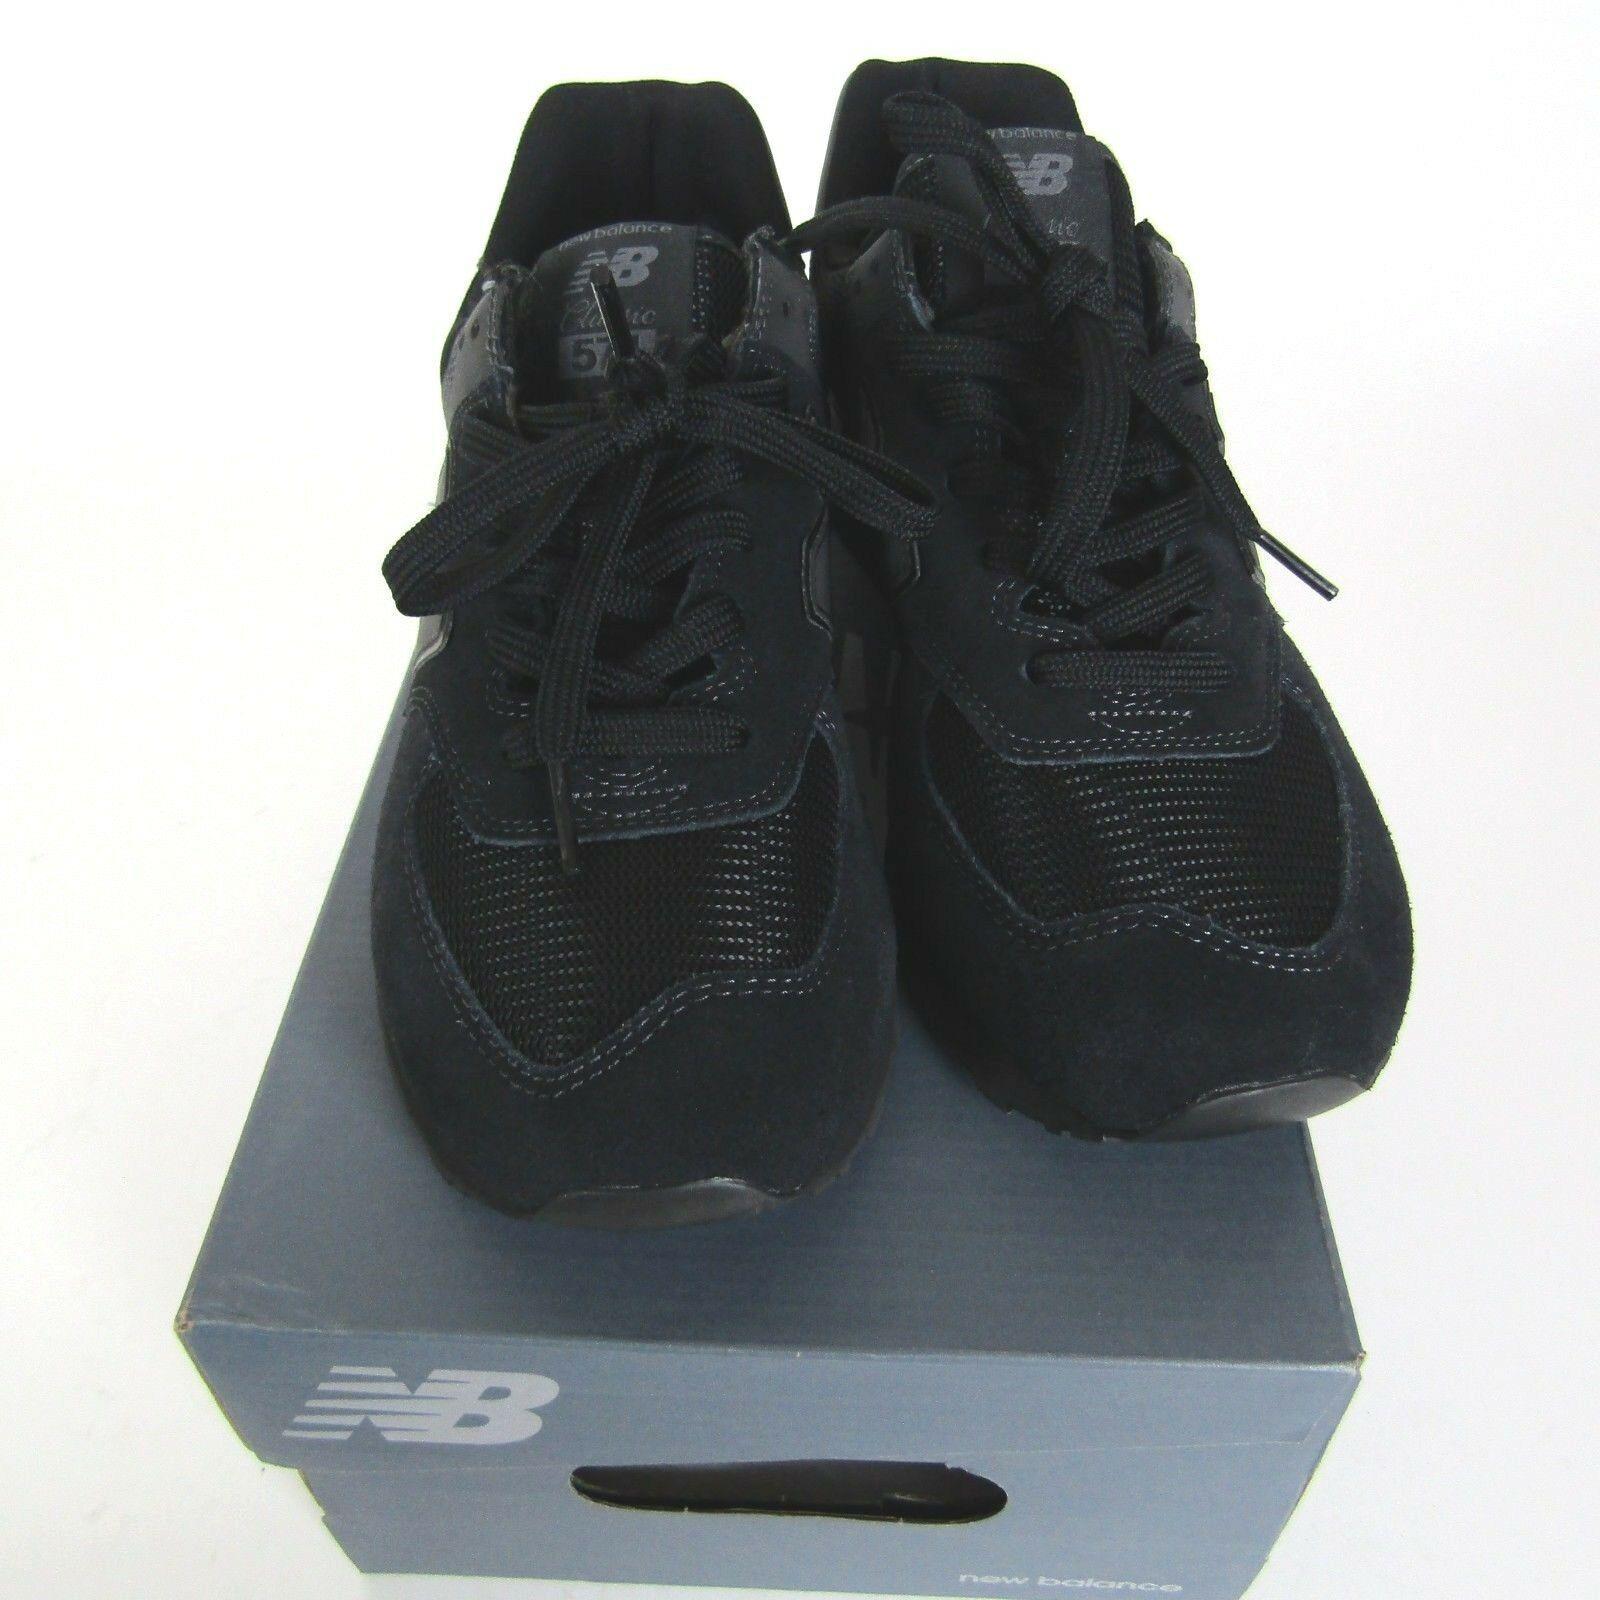 New Balance 574 Men's Sport Sneakers Walking Shoes ML574ETE Men's size 9.5